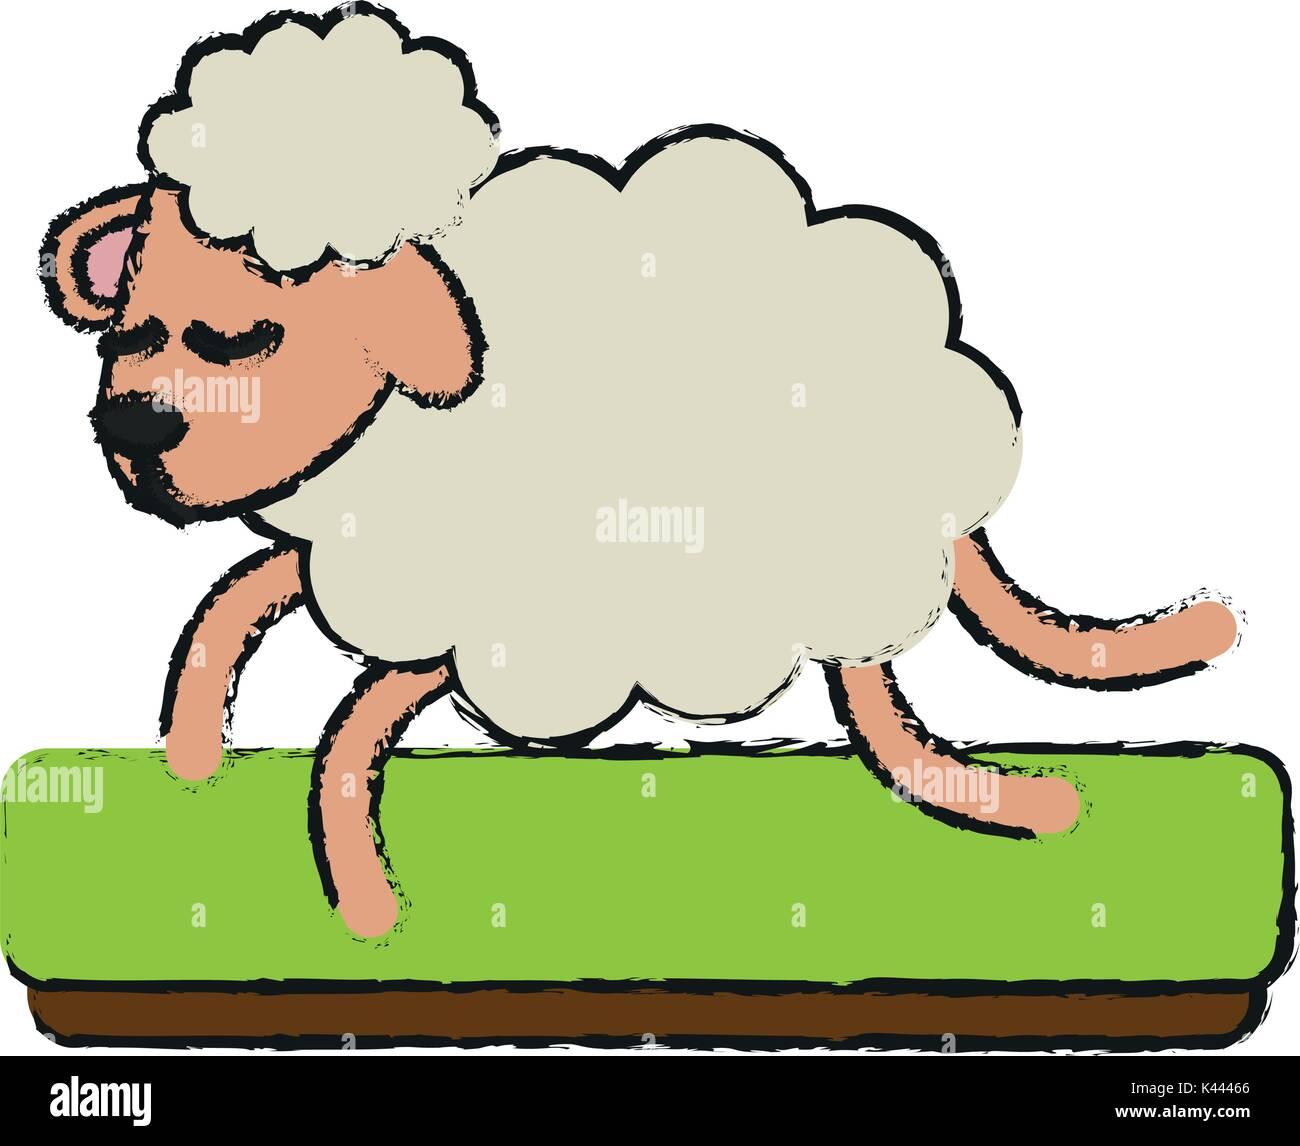 Funny Cartoon Sheep Imágenes De Stock & Funny Cartoon Sheep Fotos De ...